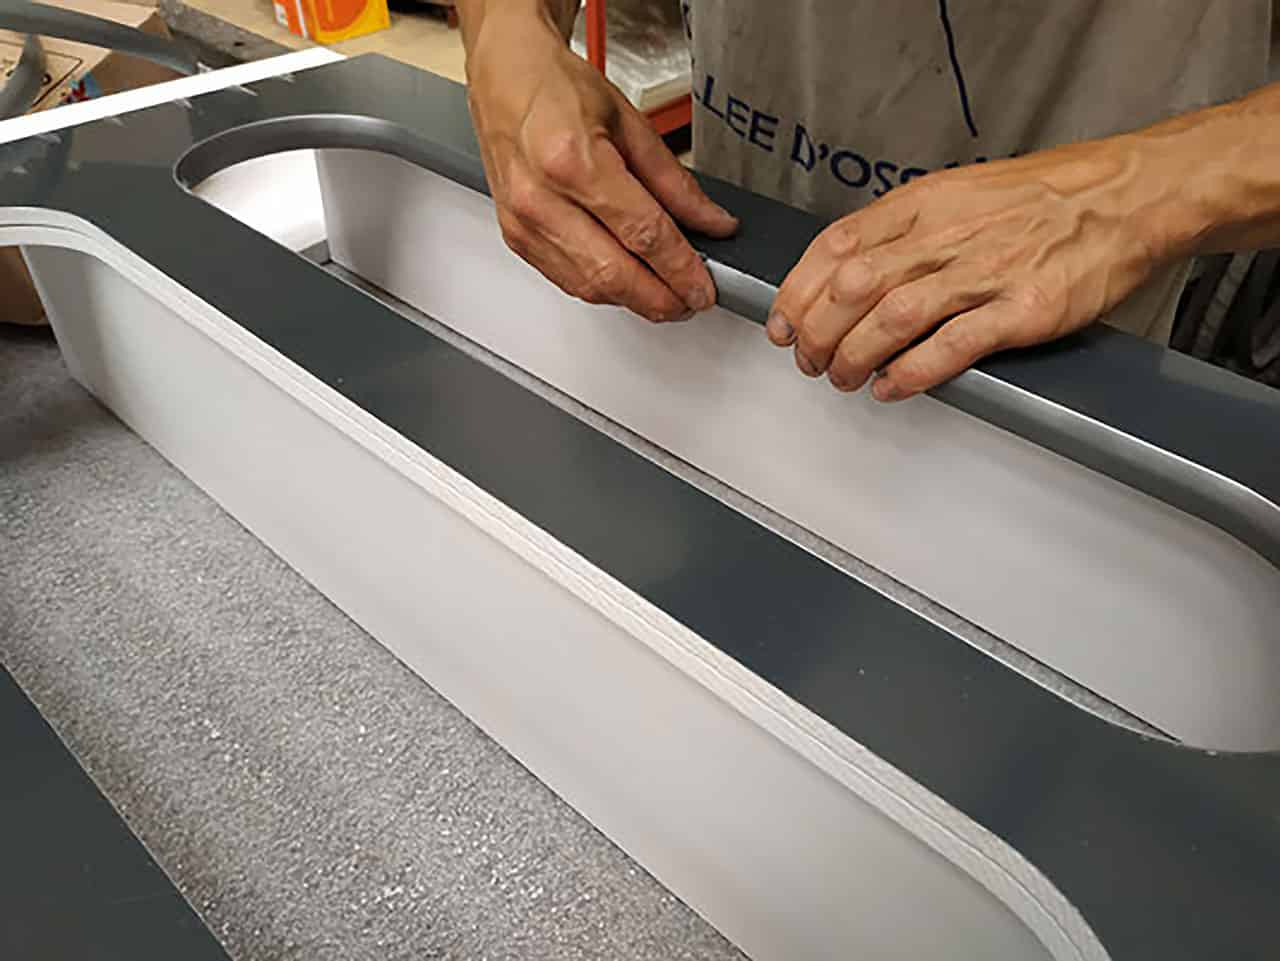 hango-trailers-modeles-options-acces-fabrication-2